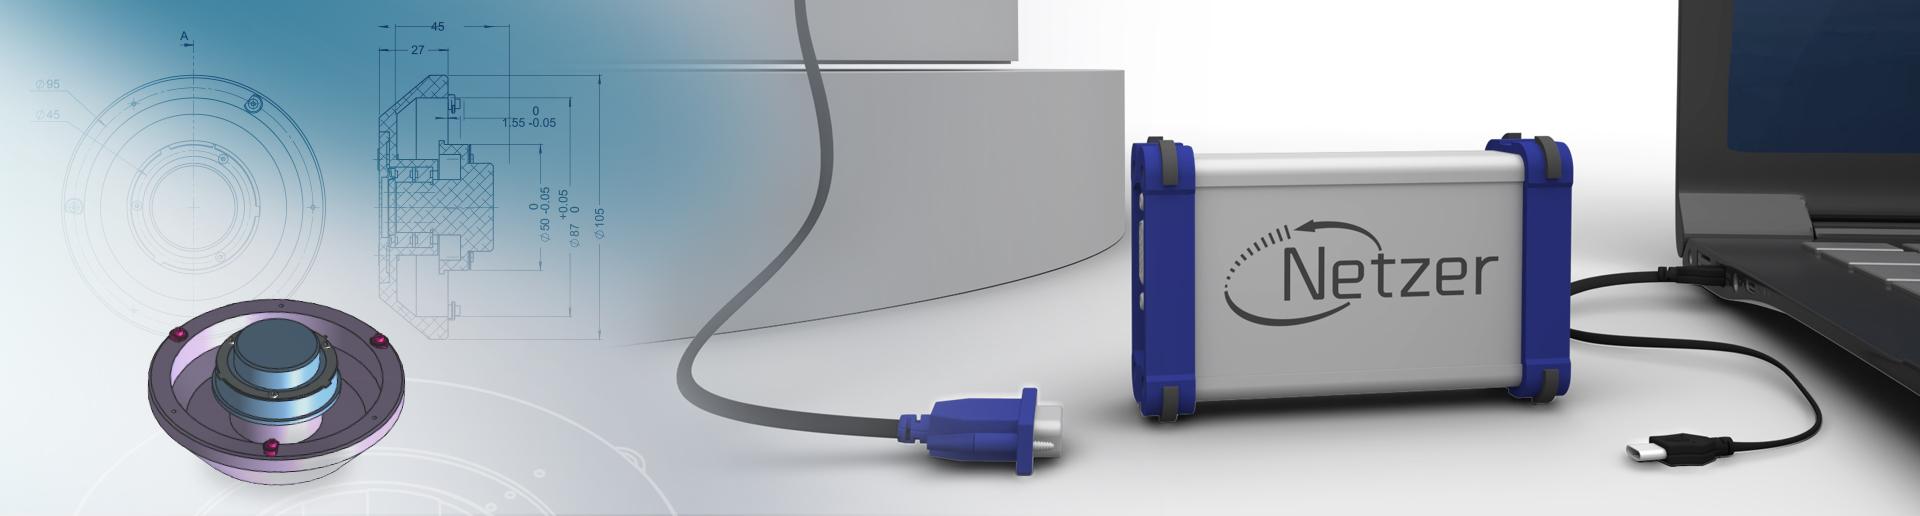 Netzer NANOMIC CONVERTER with rotary encoder